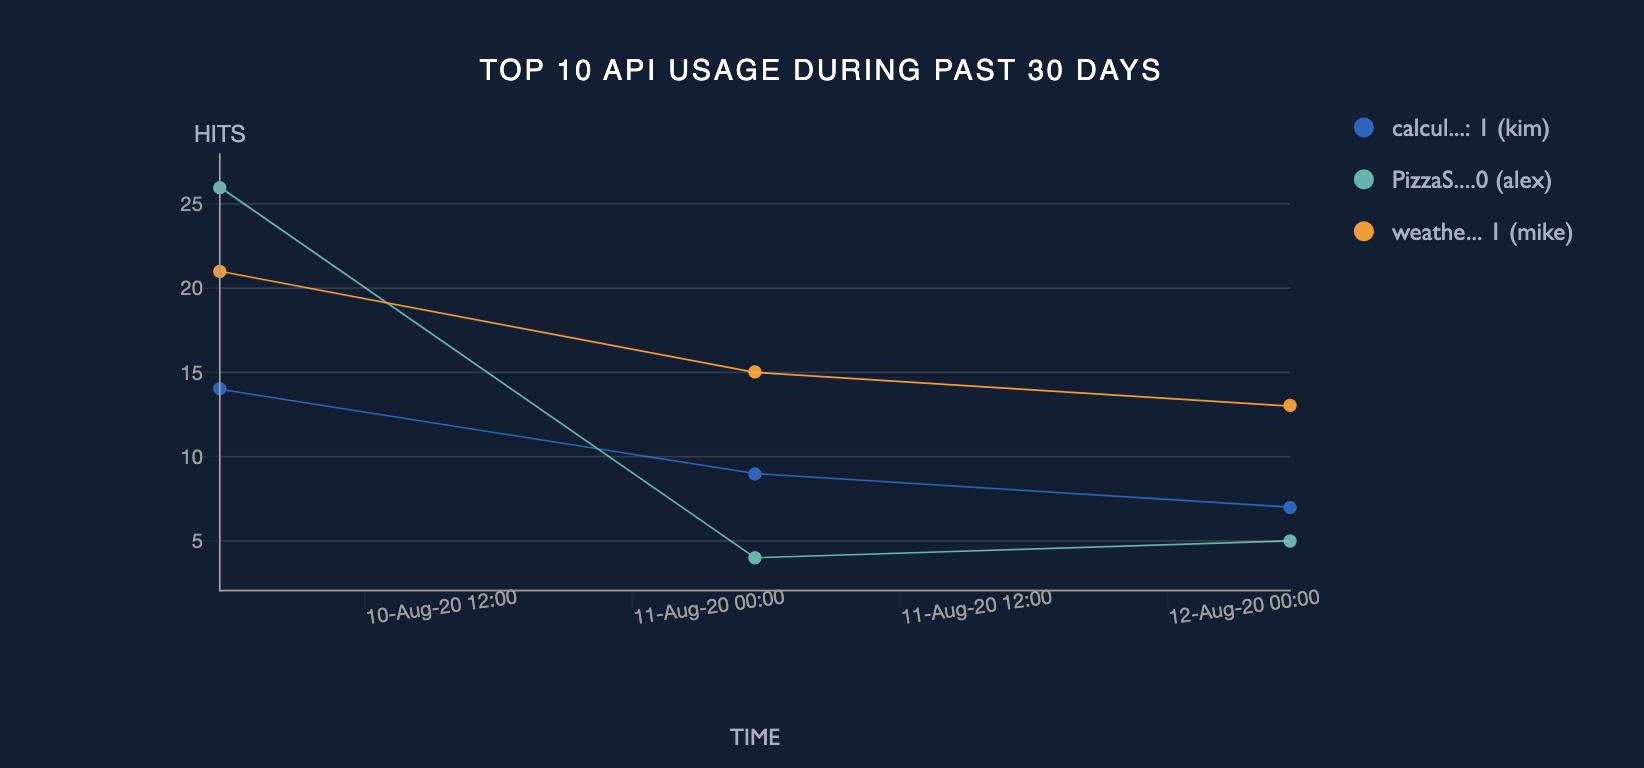 Top 10 API usage during past 30 days